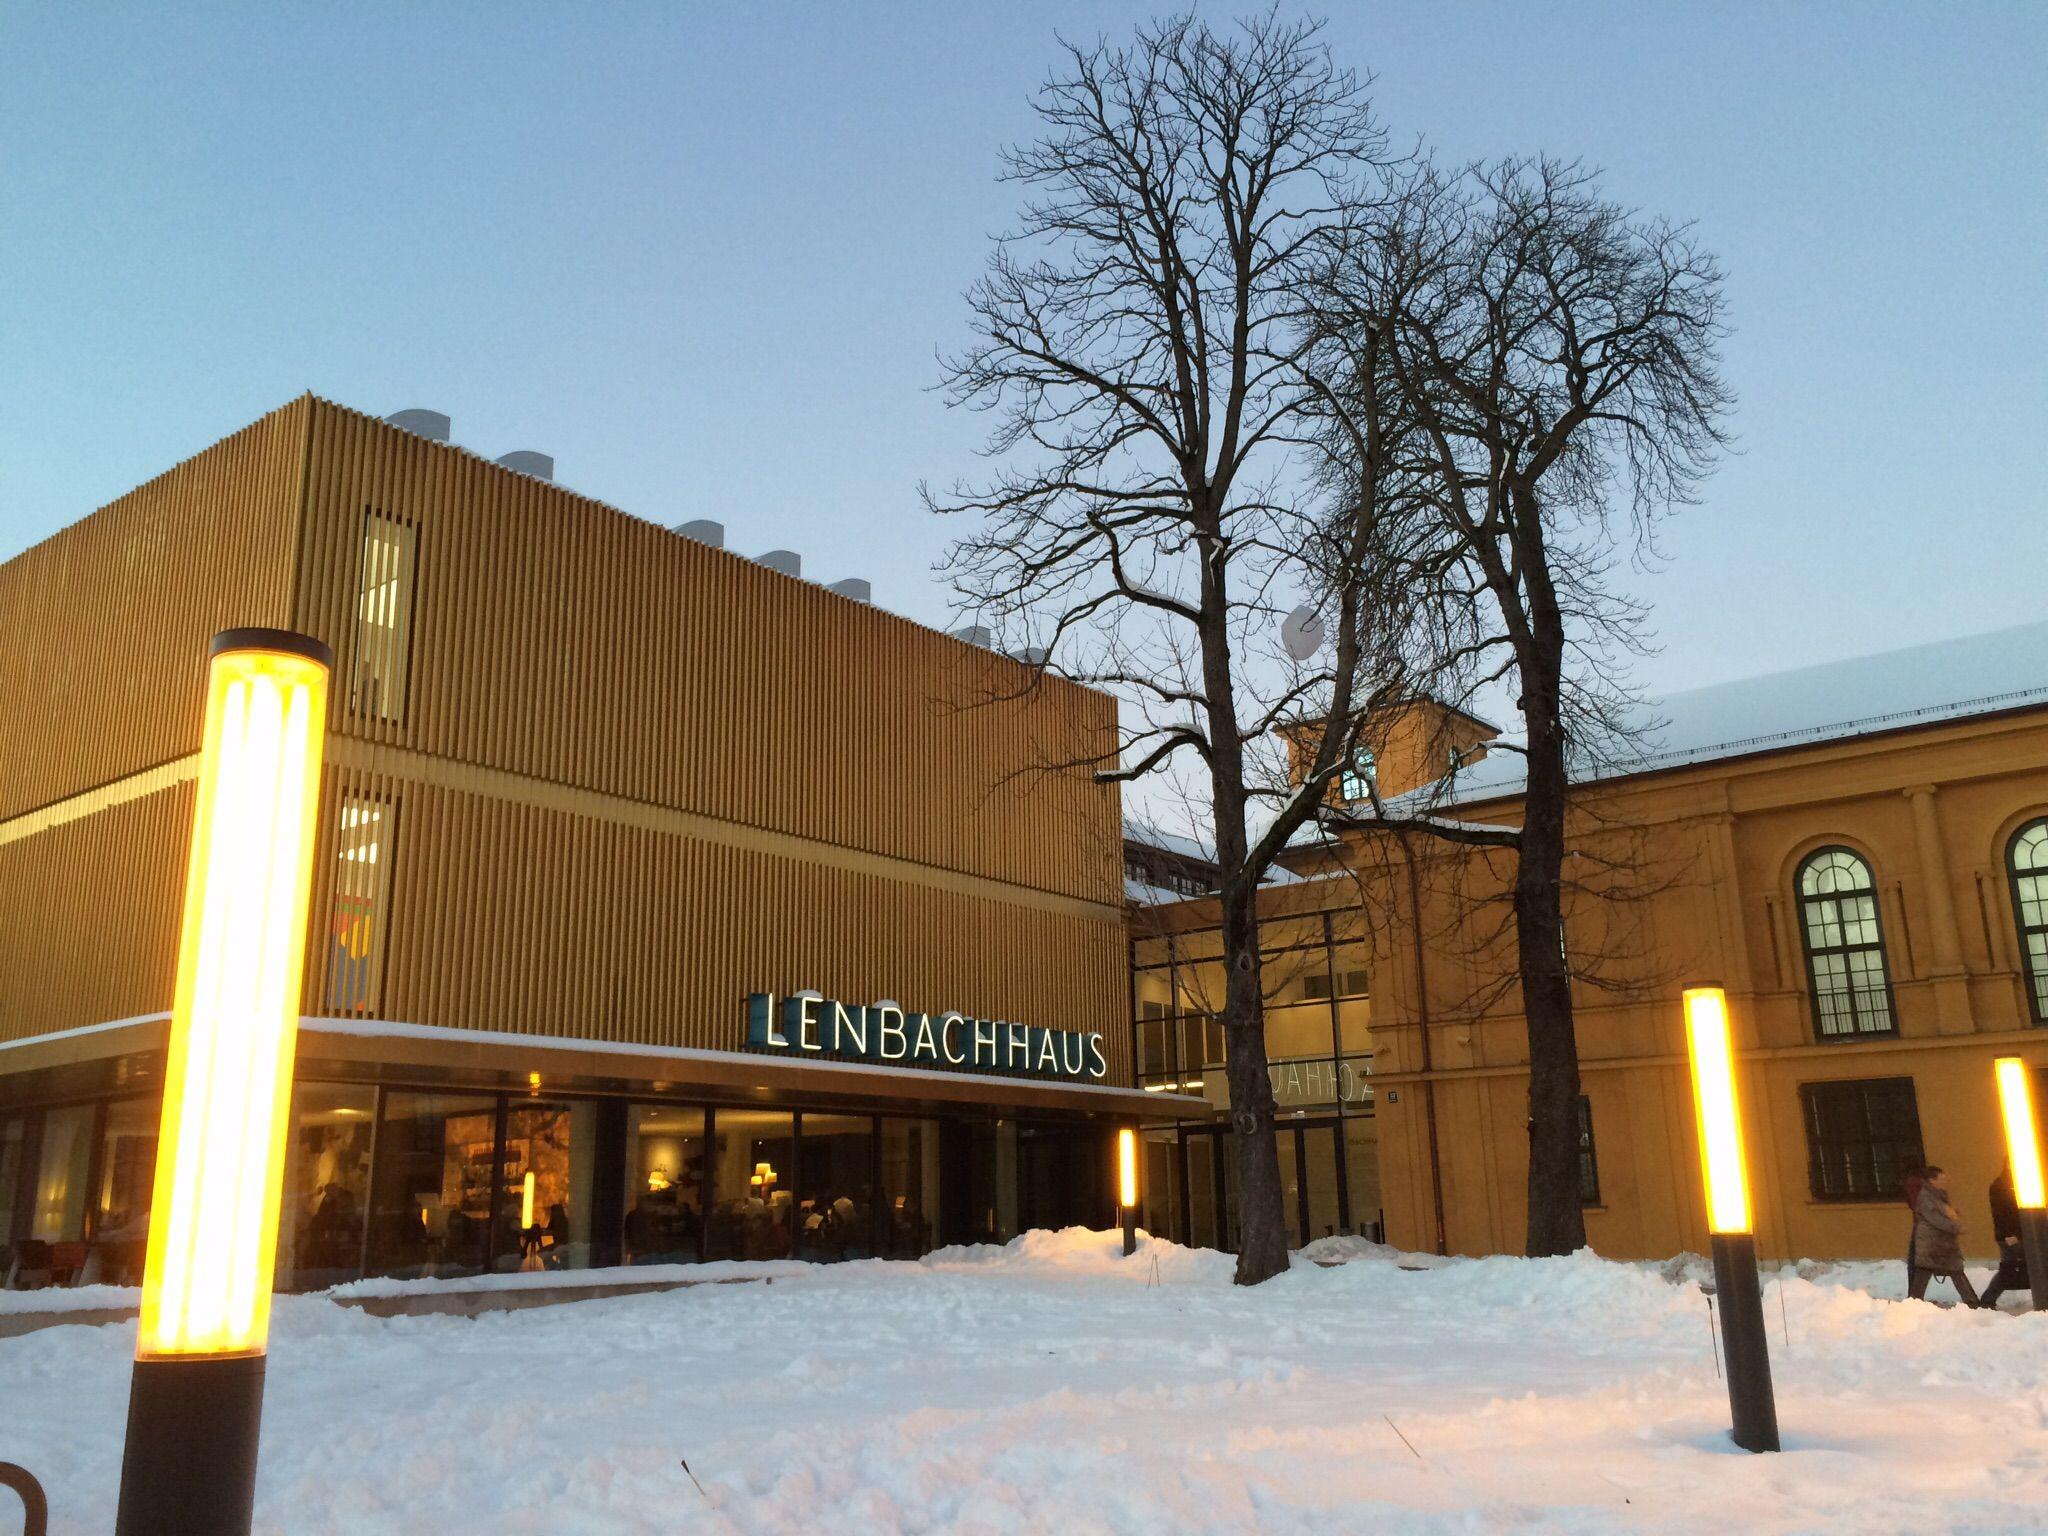 Stadtische Galerie Im Lenbachhaus In 2020 Scenic Views Visiting Kandinsky